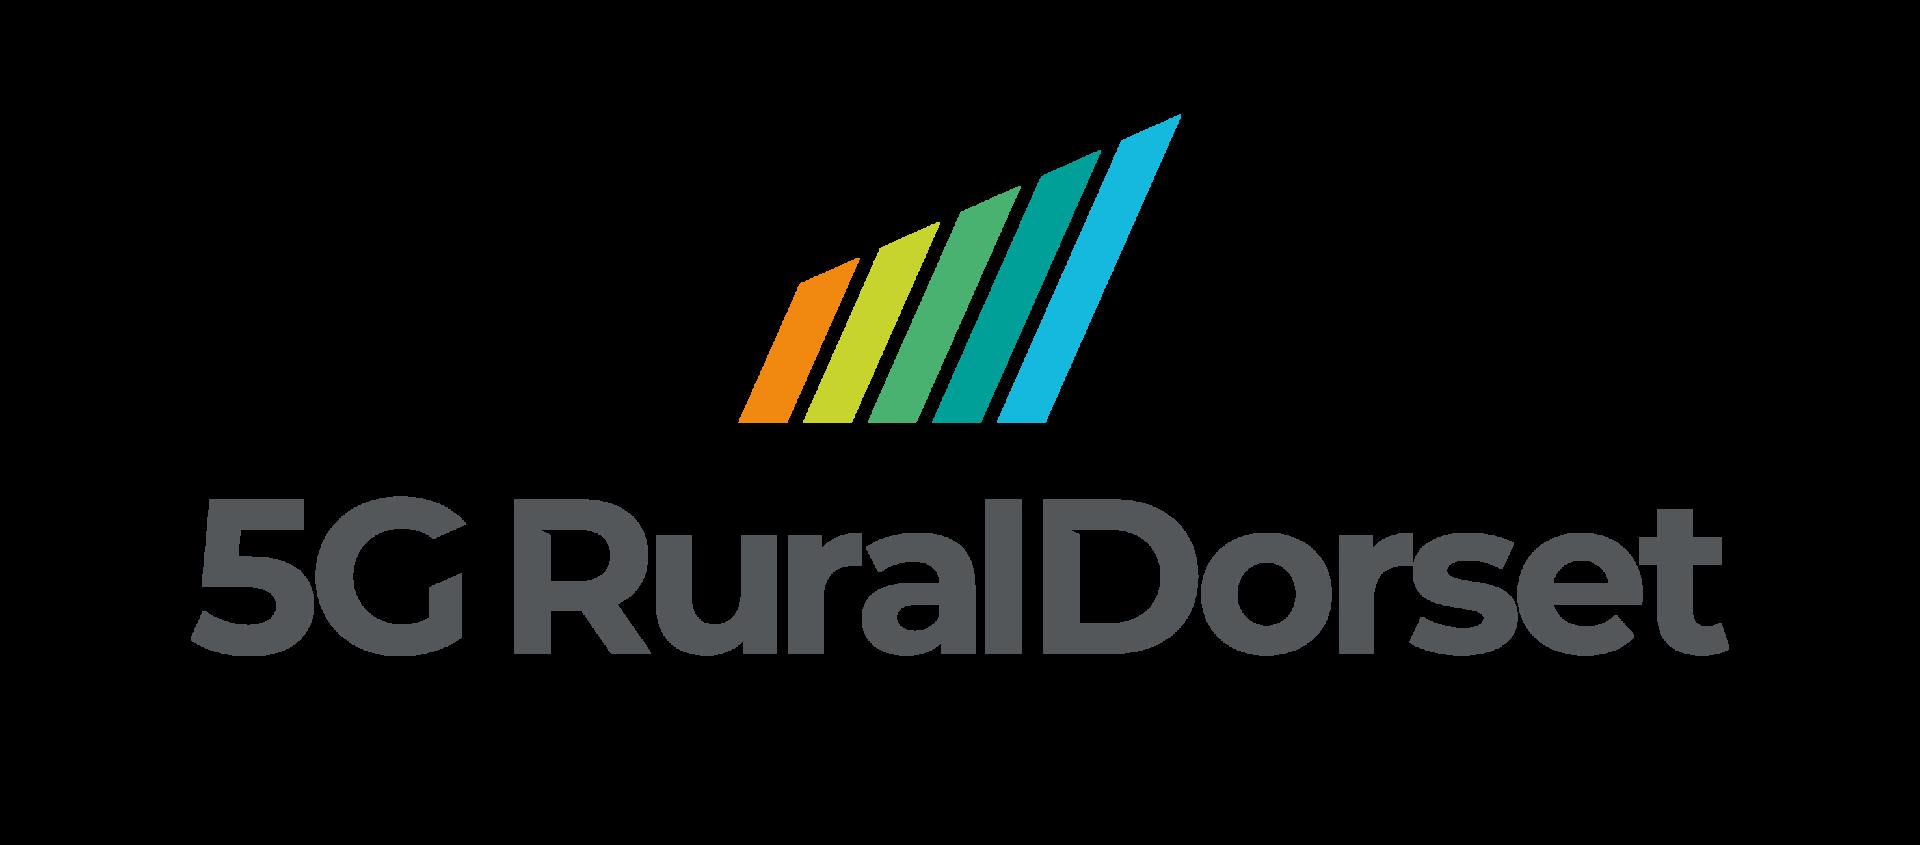 5G RuralDorset – introducing project partner Excelerate